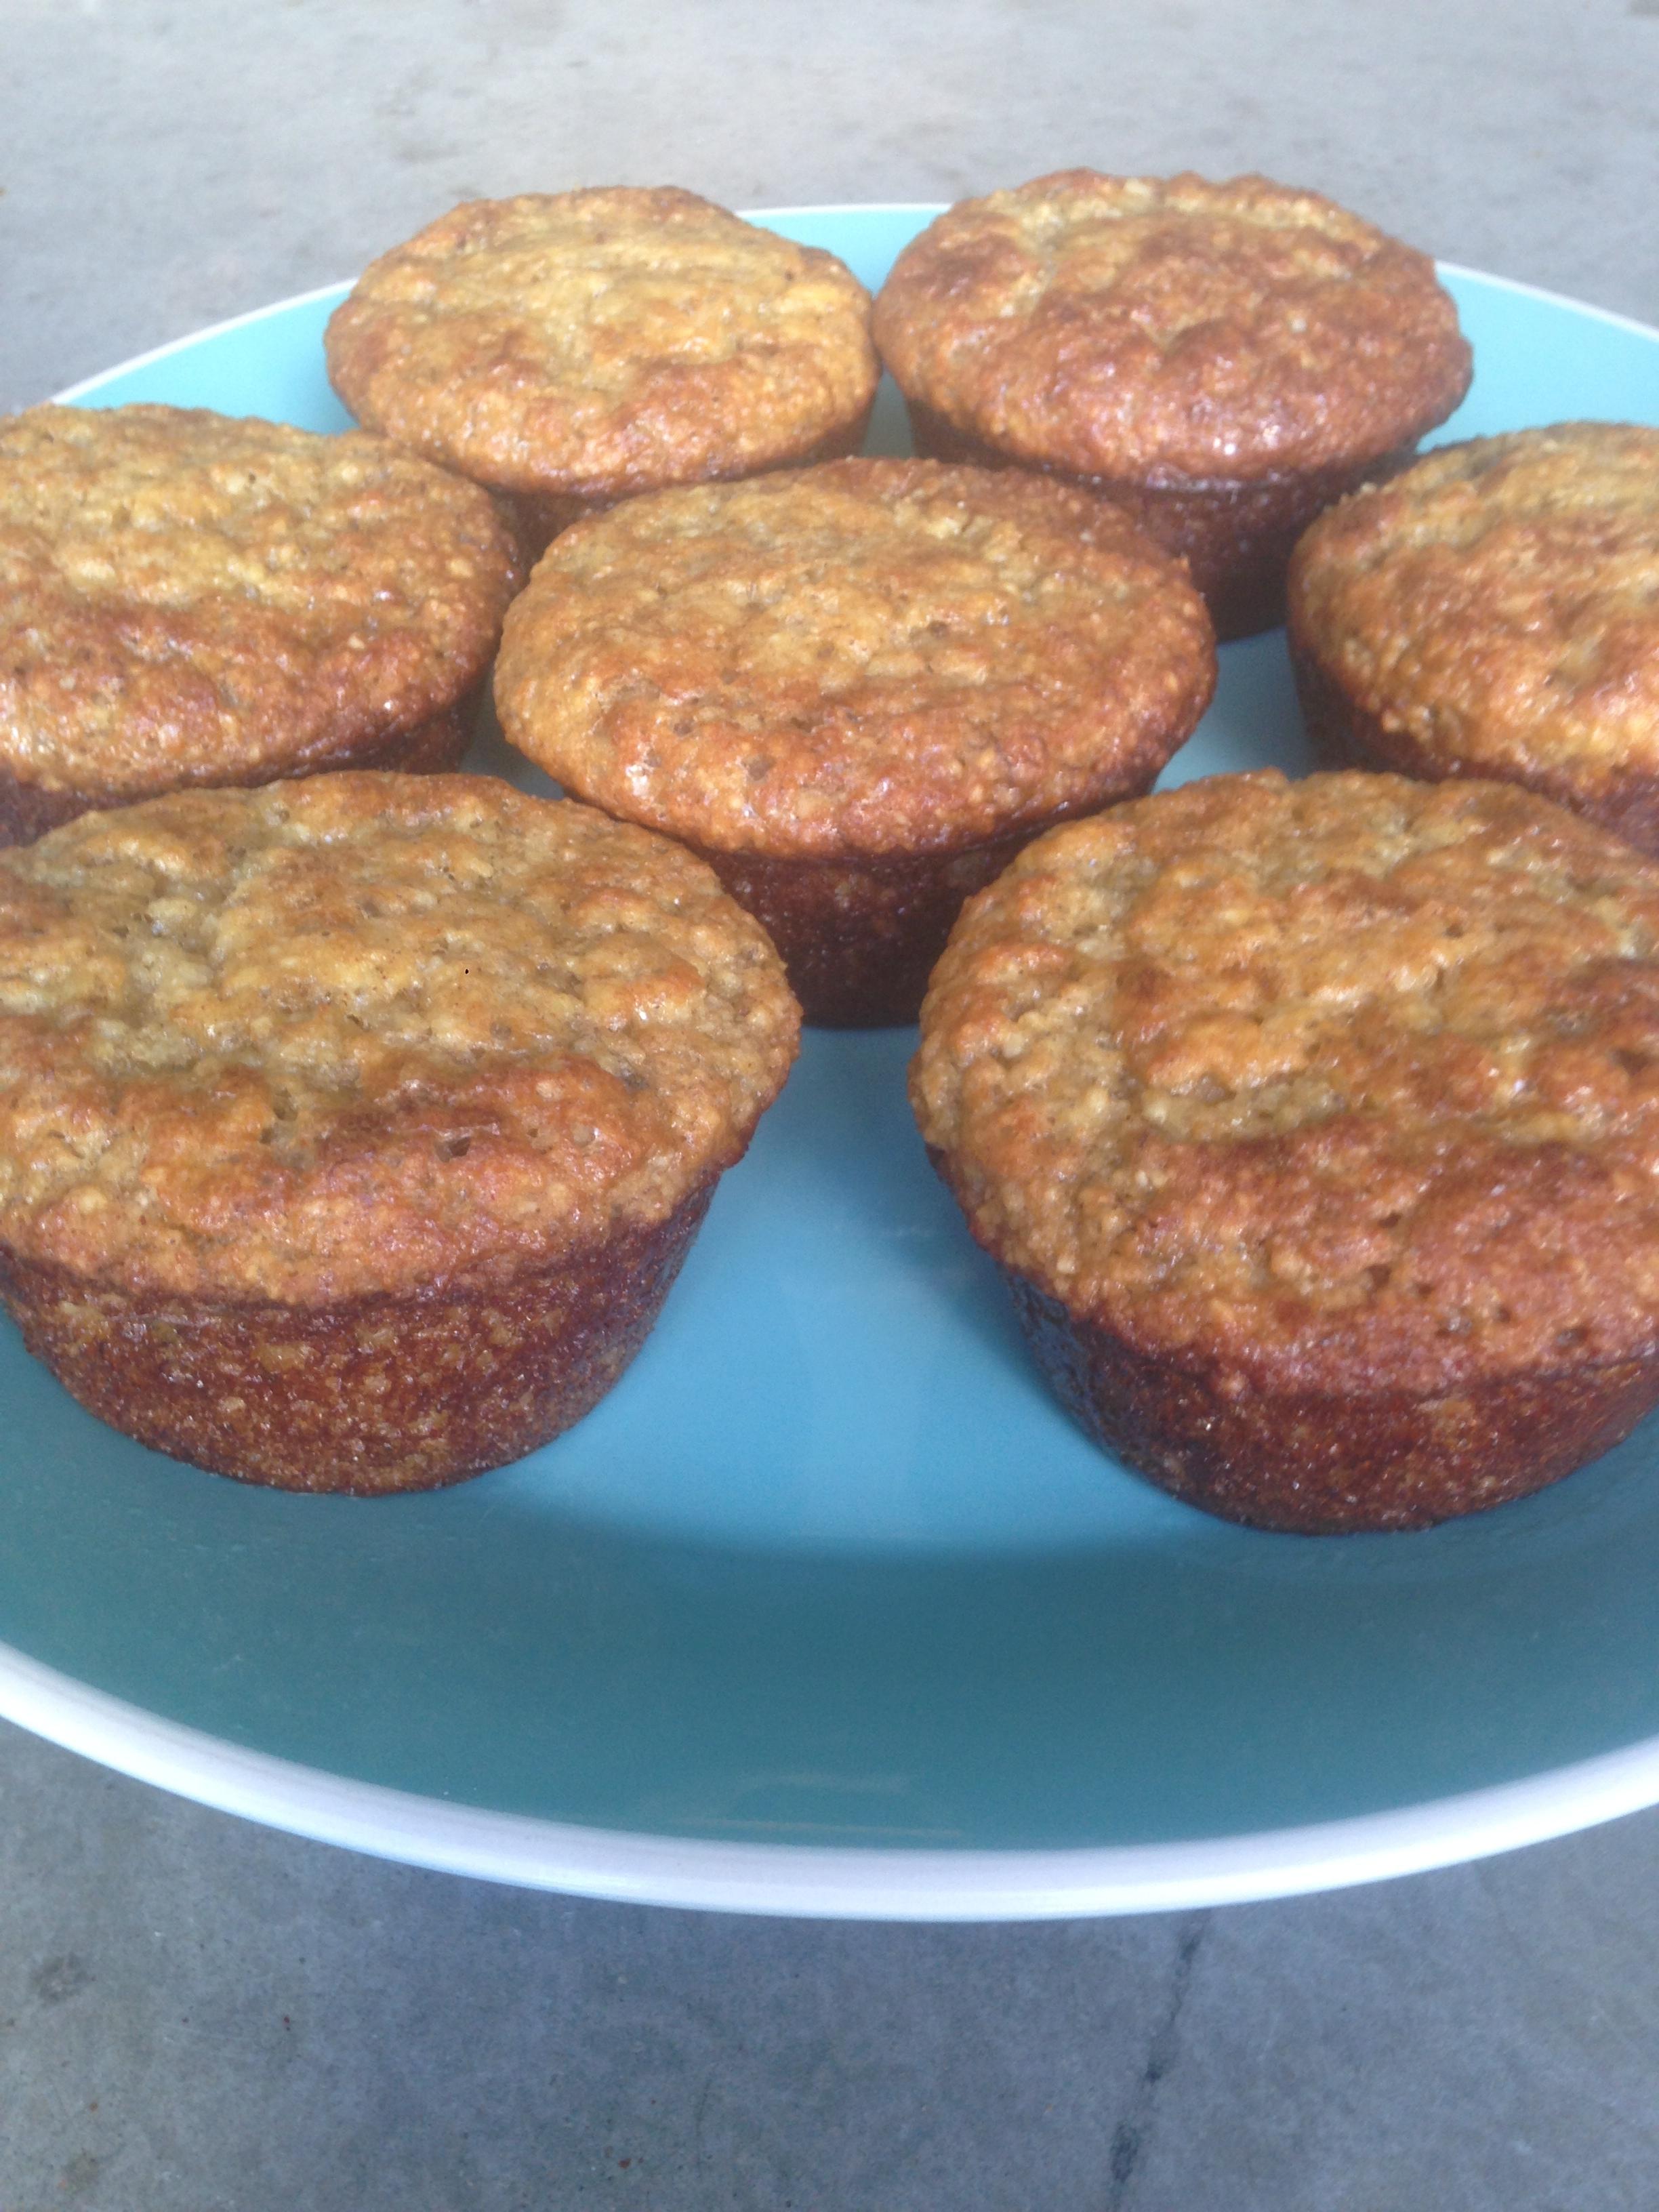 Guilt-free Gluten-free Banana Nut Muffins